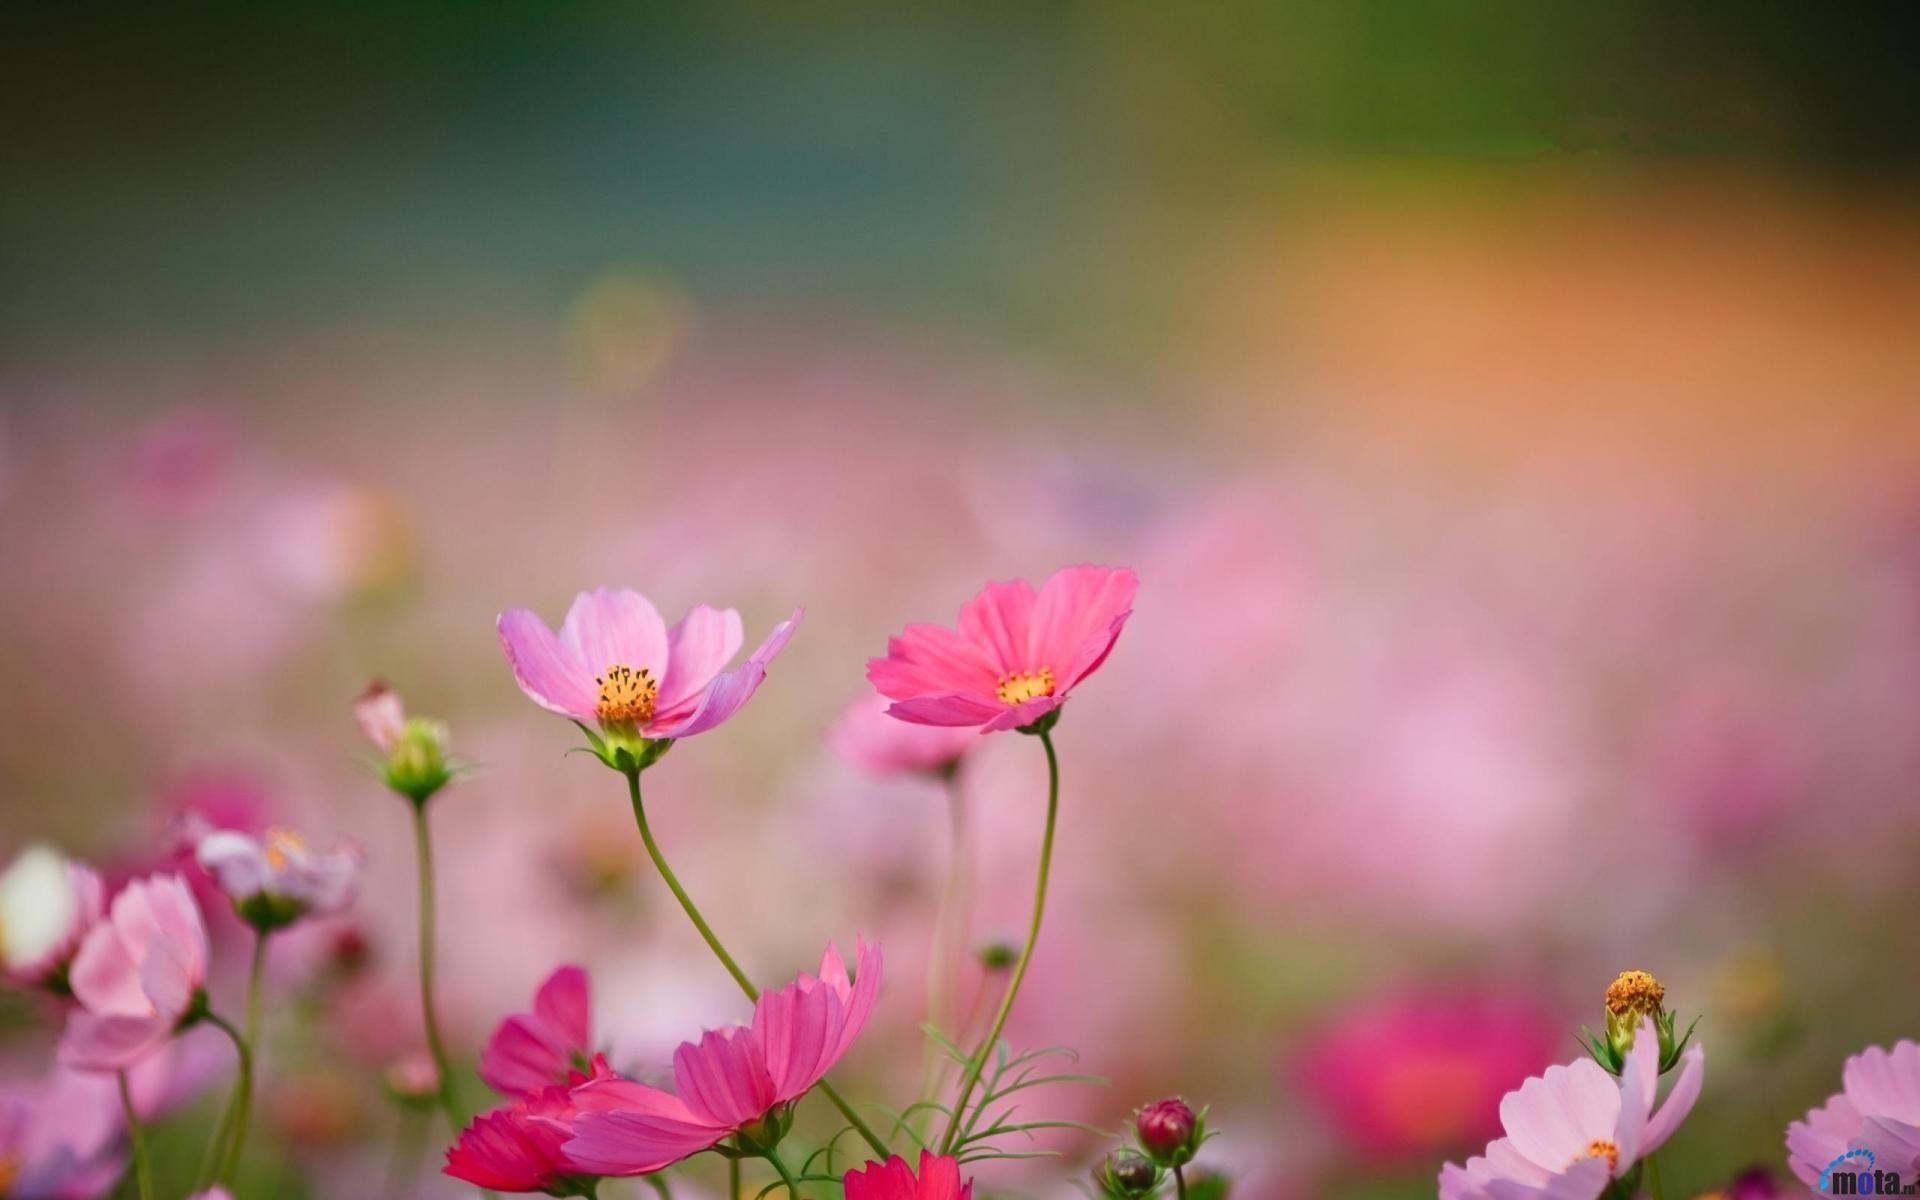 Http Img Mota Ru Upload Wallpapers 2011 02 22 23 00 24285 Mota Ru 1022301 1920x1200 Jpg Wild Flowers Cosmos Flowers Flower Wallpaper